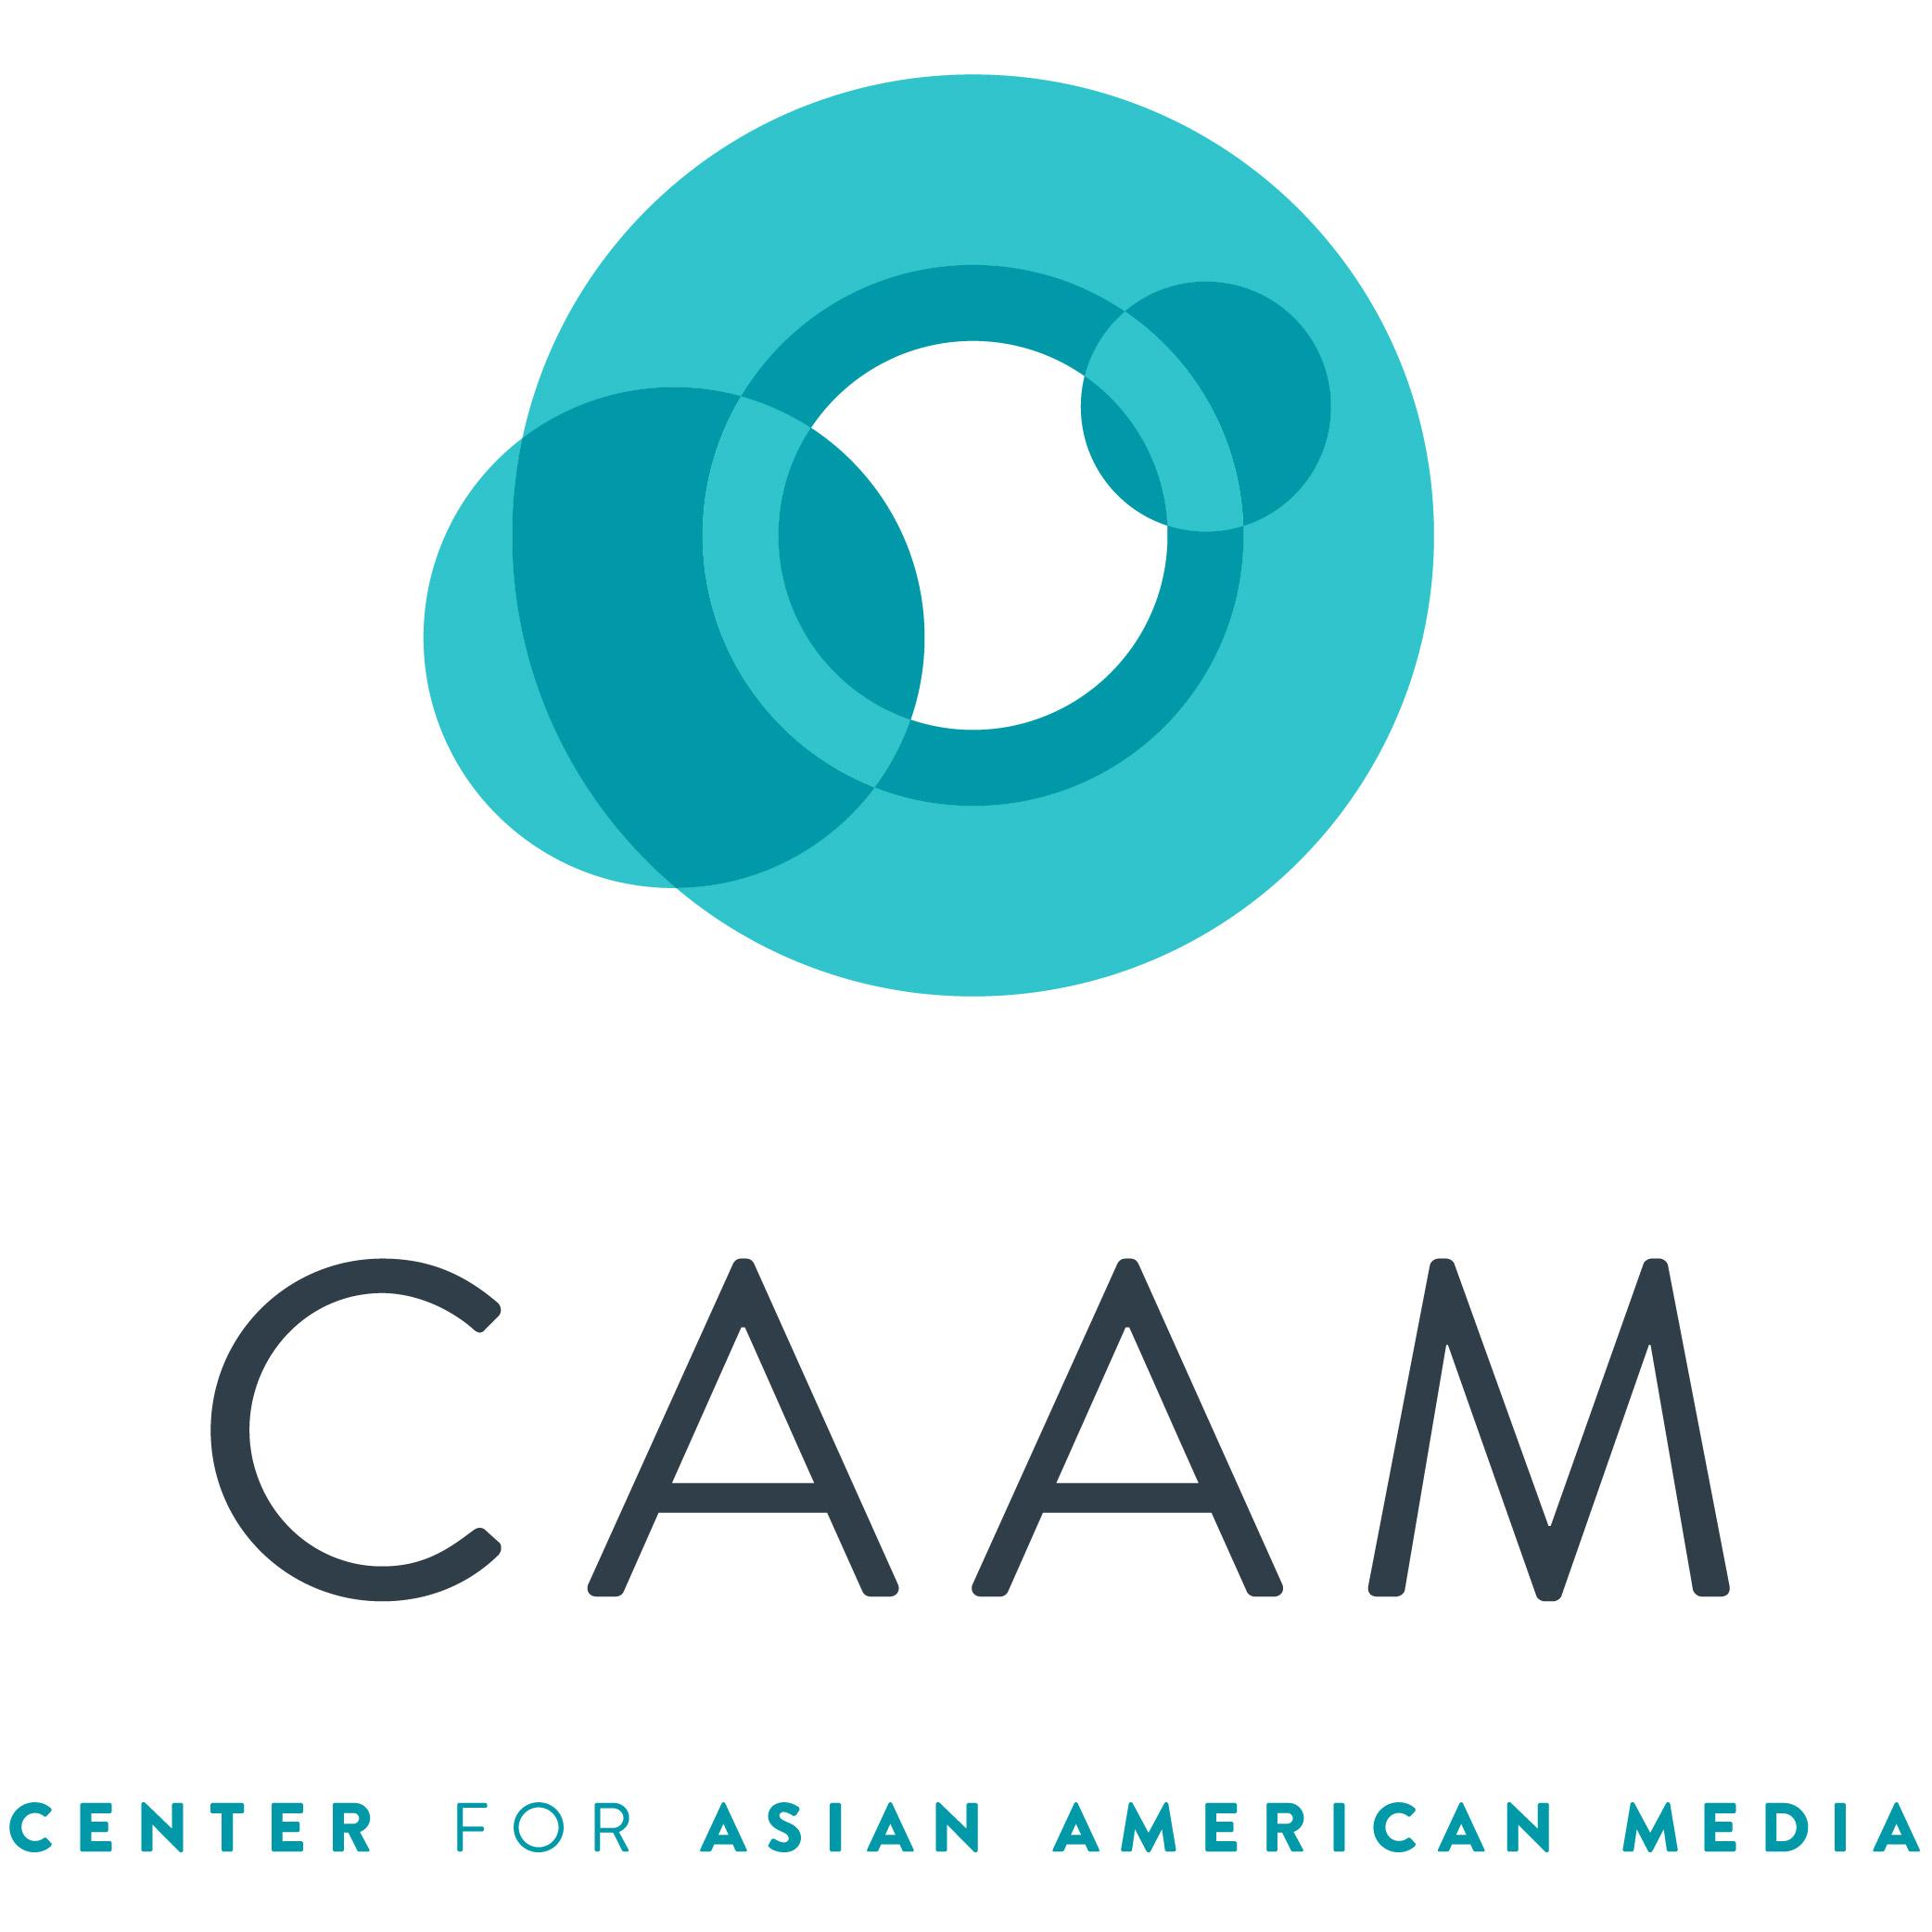 The Center for Asian American Media